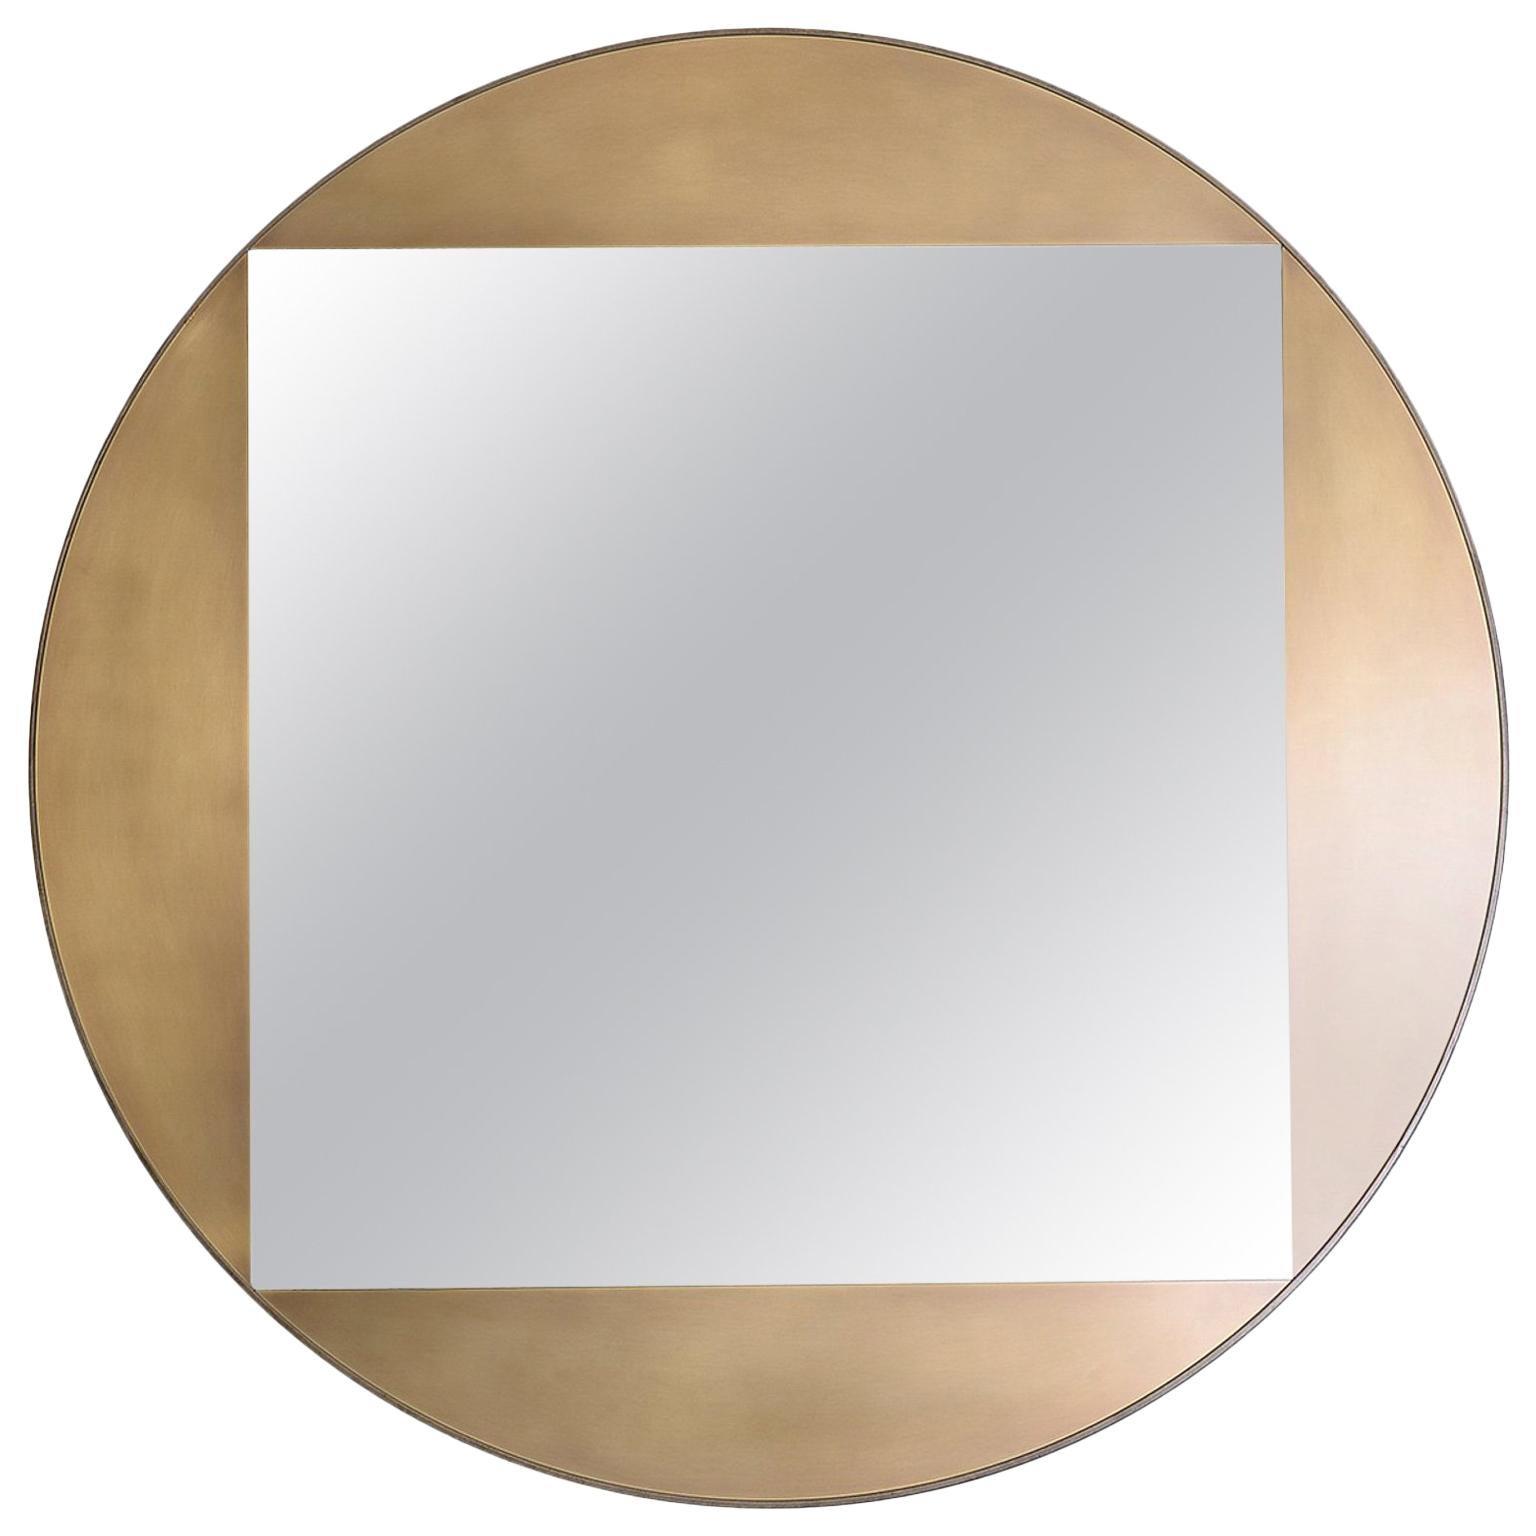 "Gotham Round Mirror 48"", Customizable"